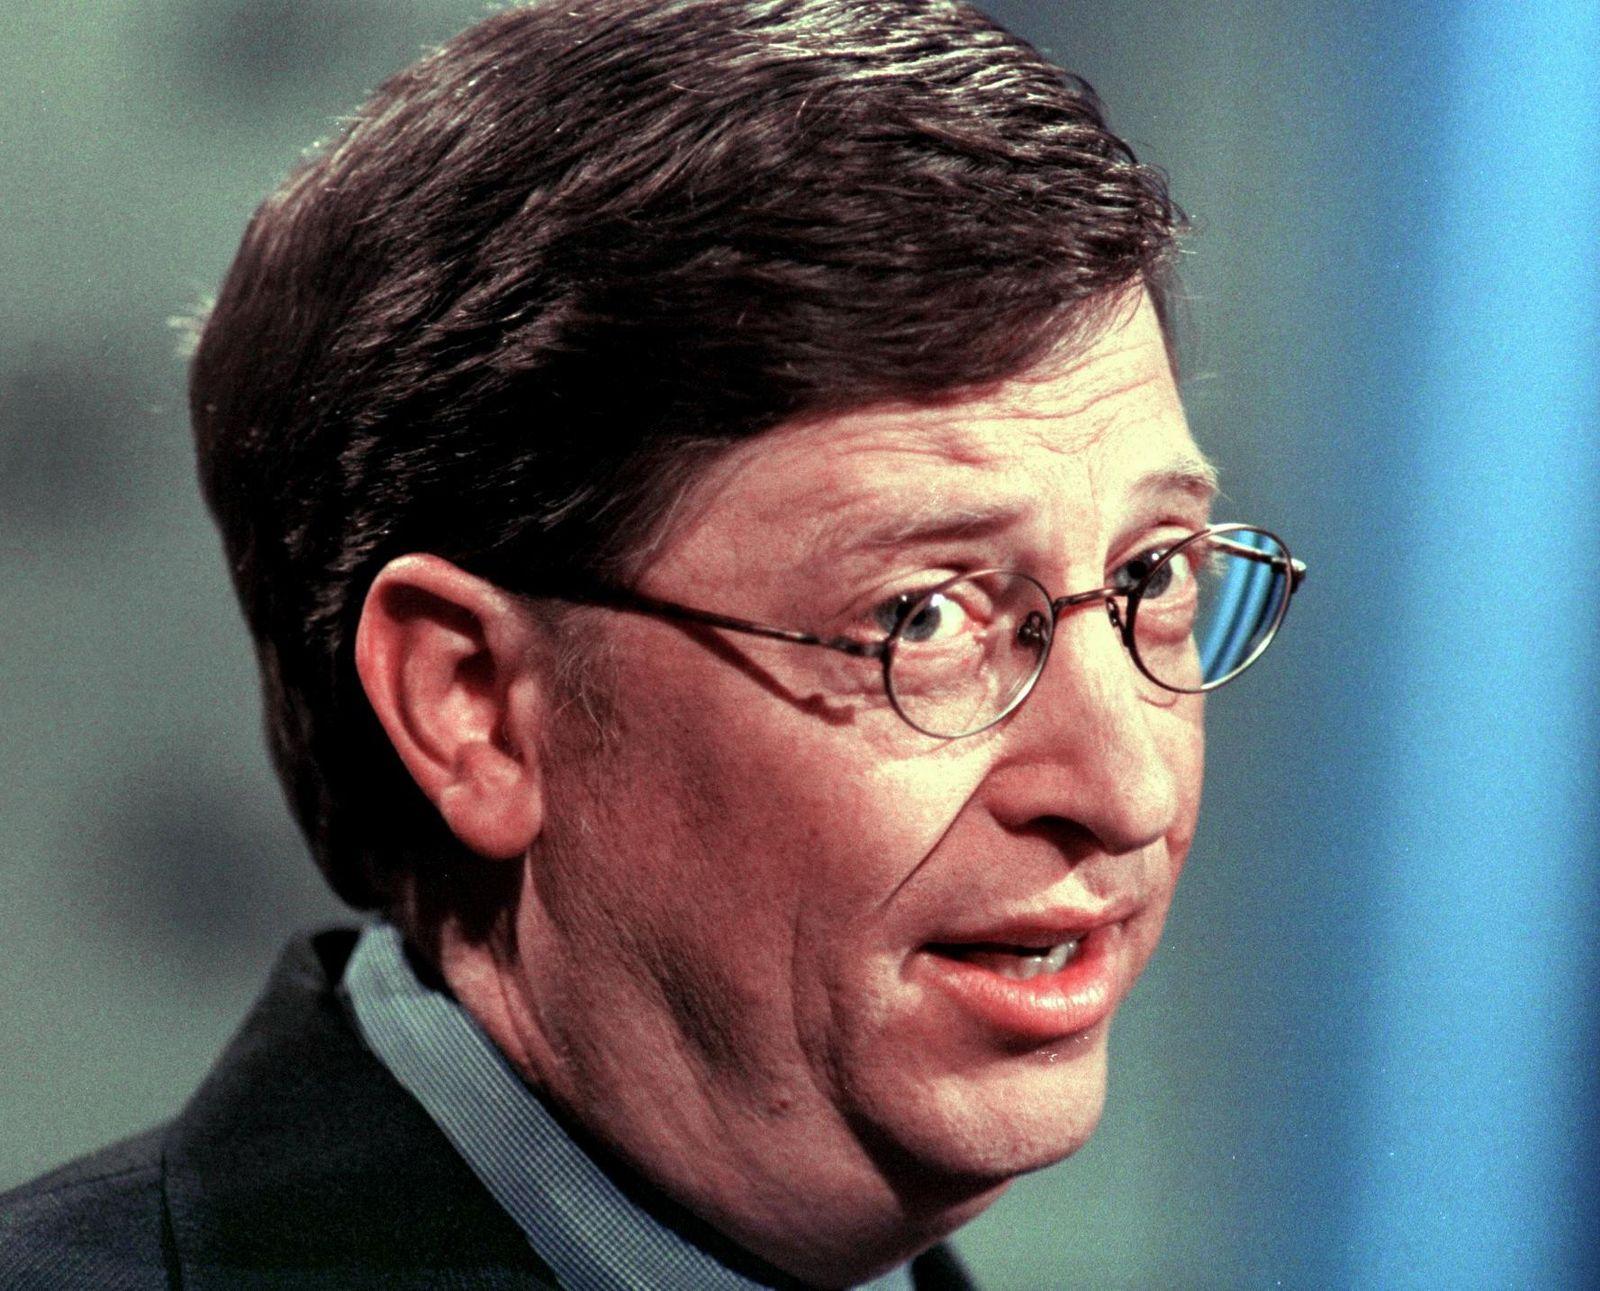 Bill Gates 2000 / Microsoft